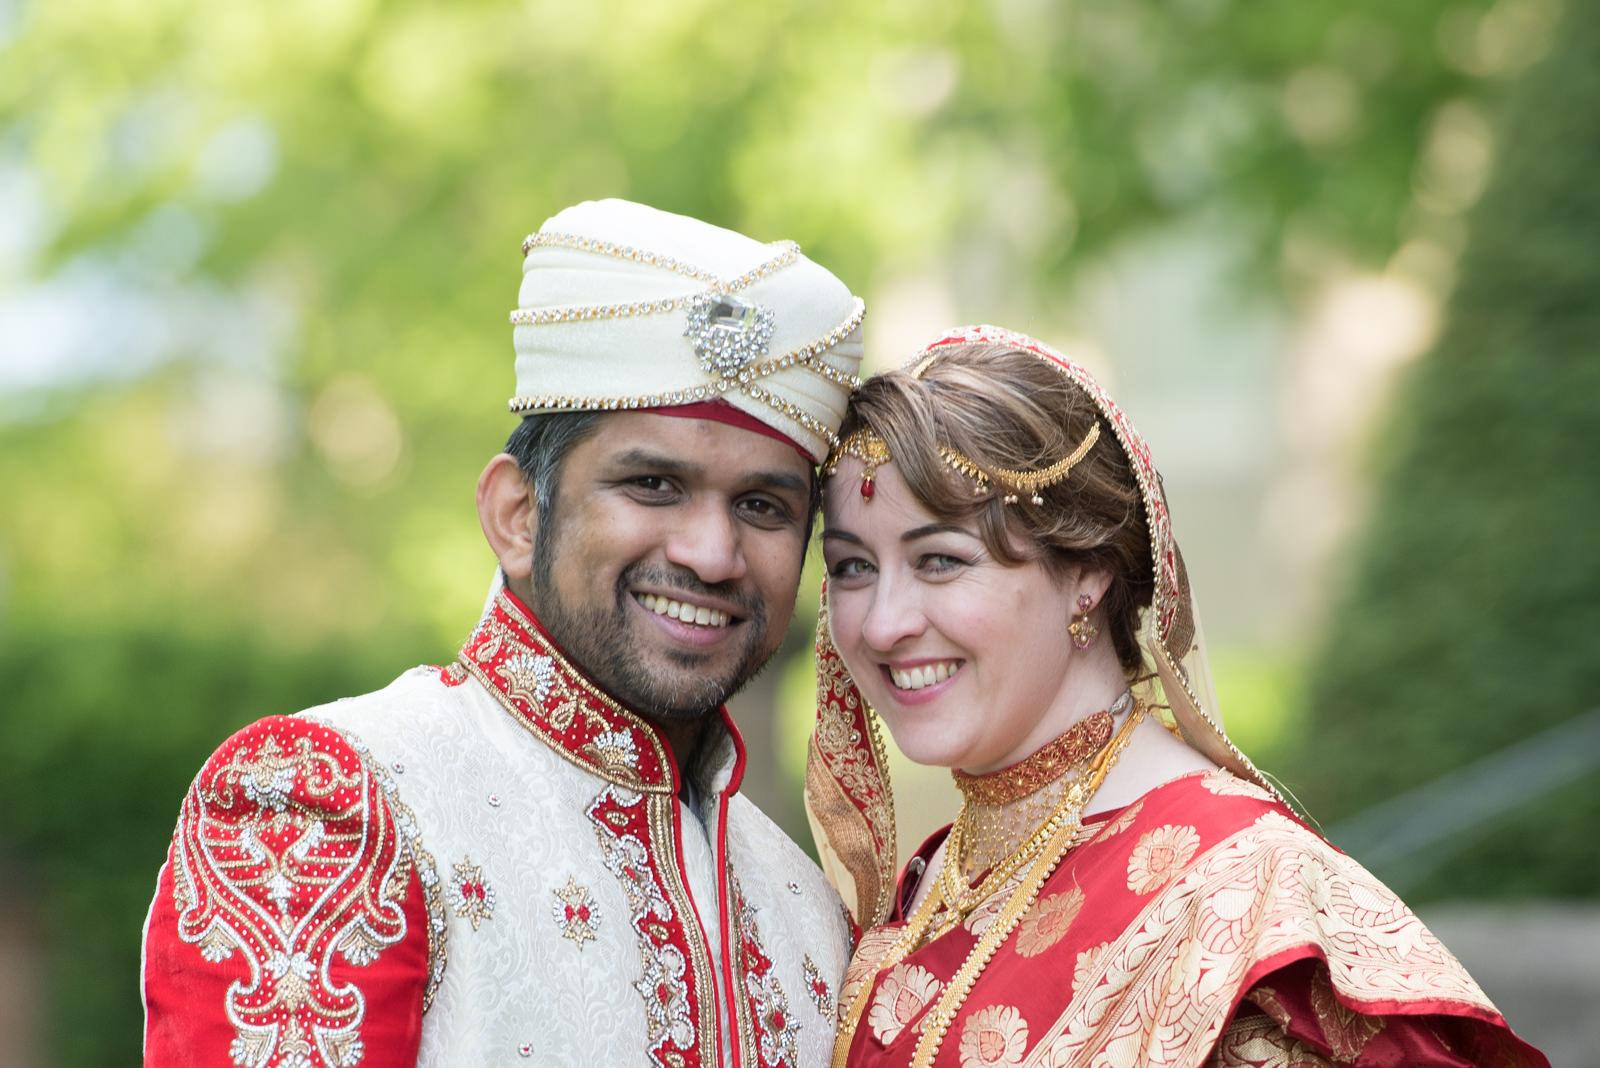 asian-wedding-nikah-ceremony-glasgow-west-end.jpg